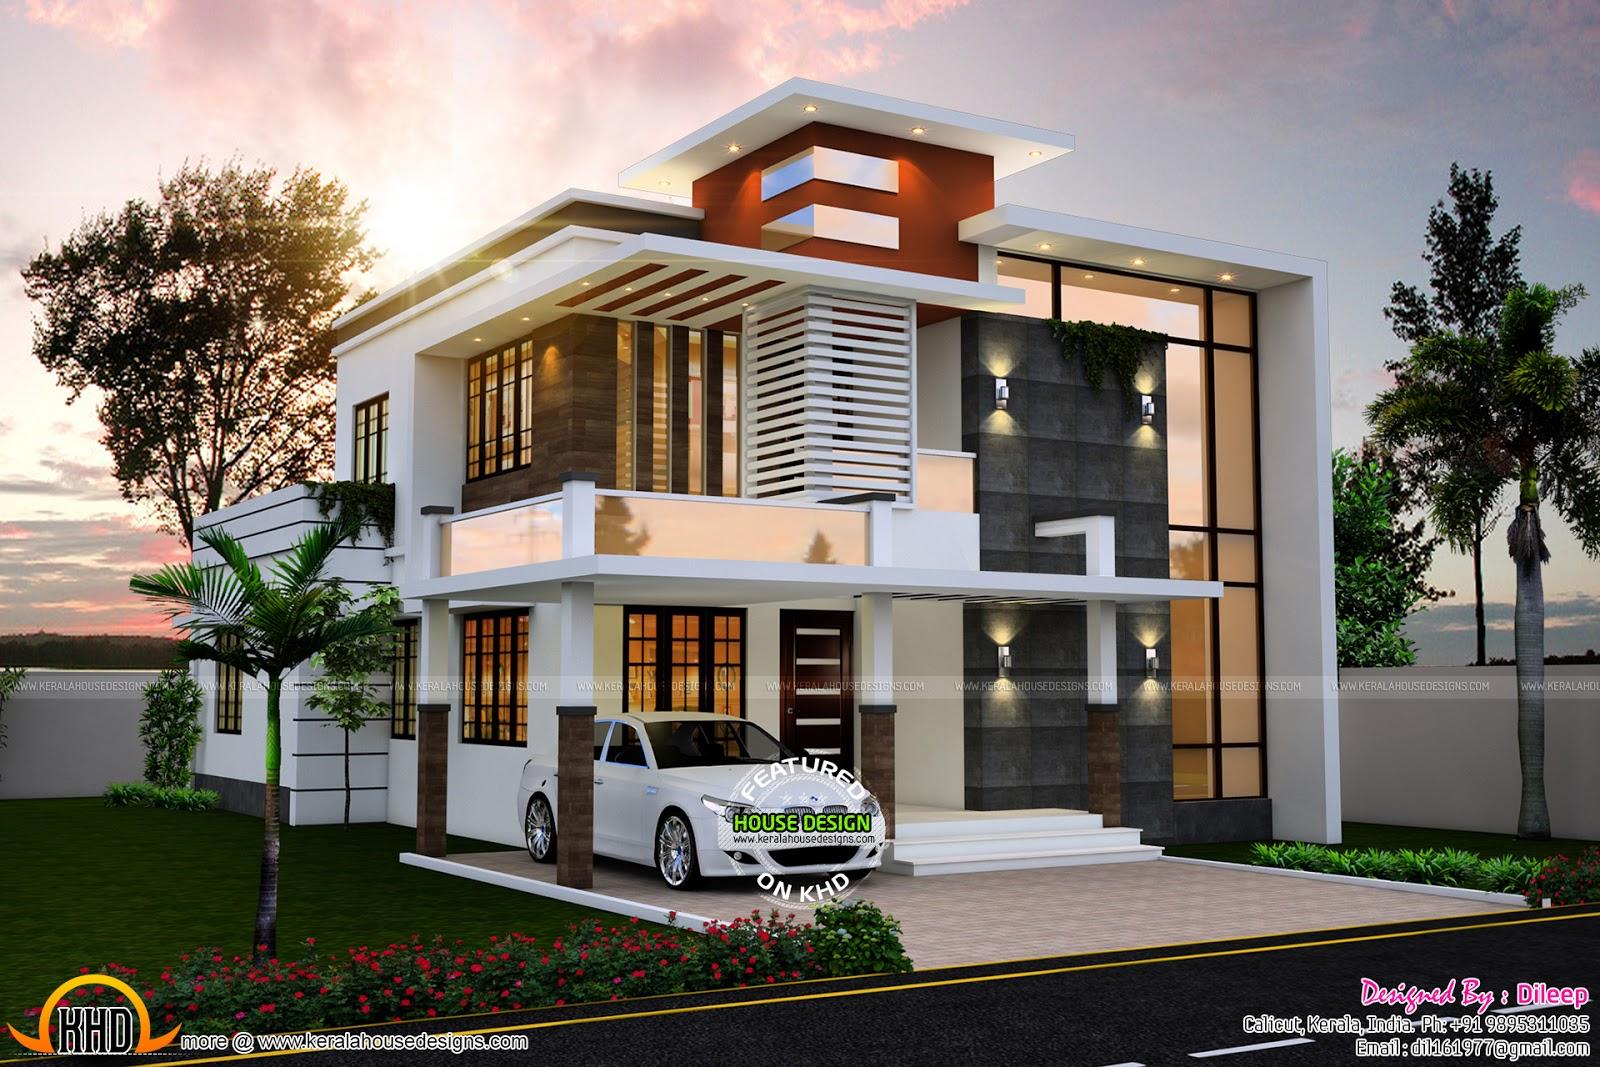 Carport Design Philippines Terrace Gazebo Designs In India Keralahousedesigns